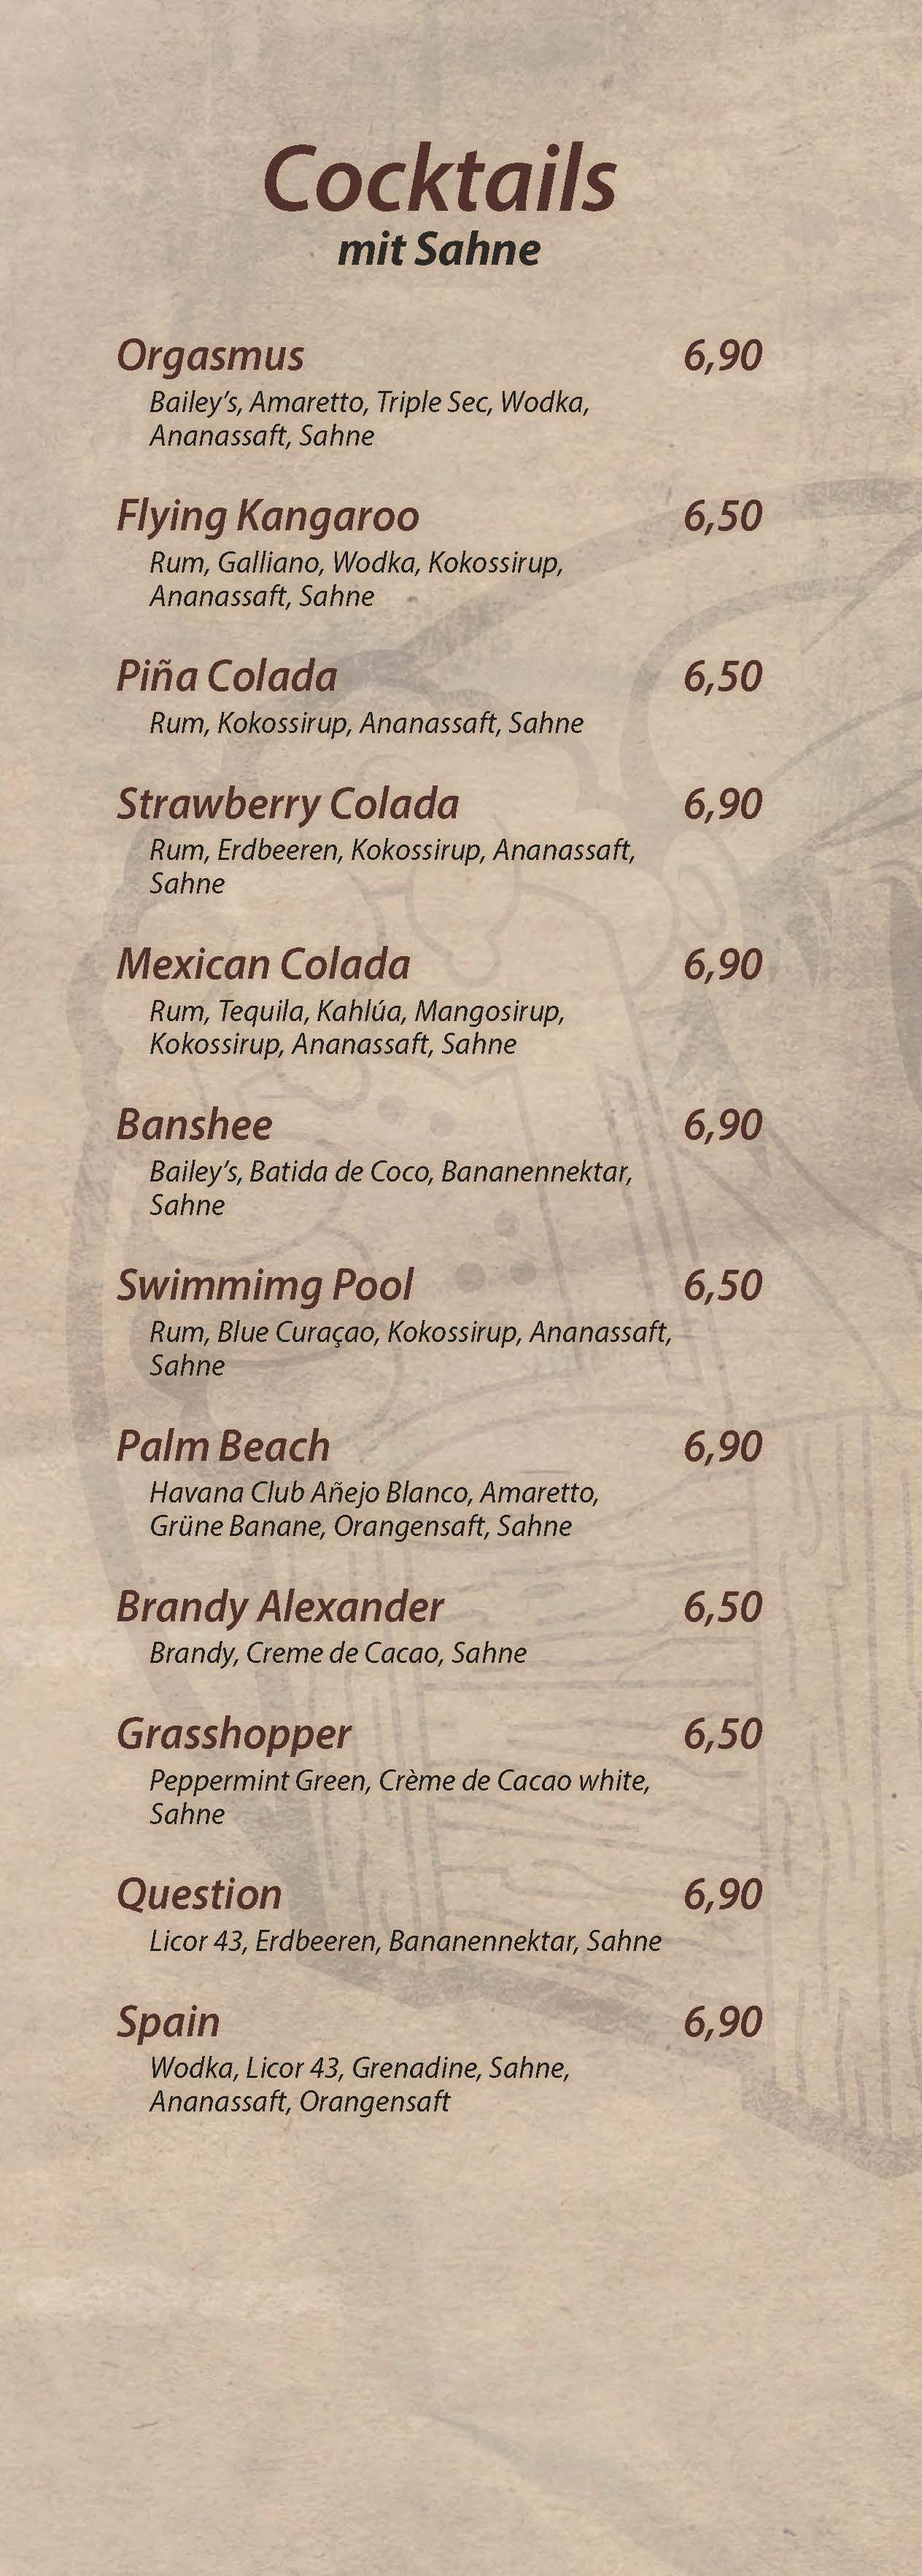 Cocktails mit Sahne - Cocktailbar Die Kiste in Cuxhaven